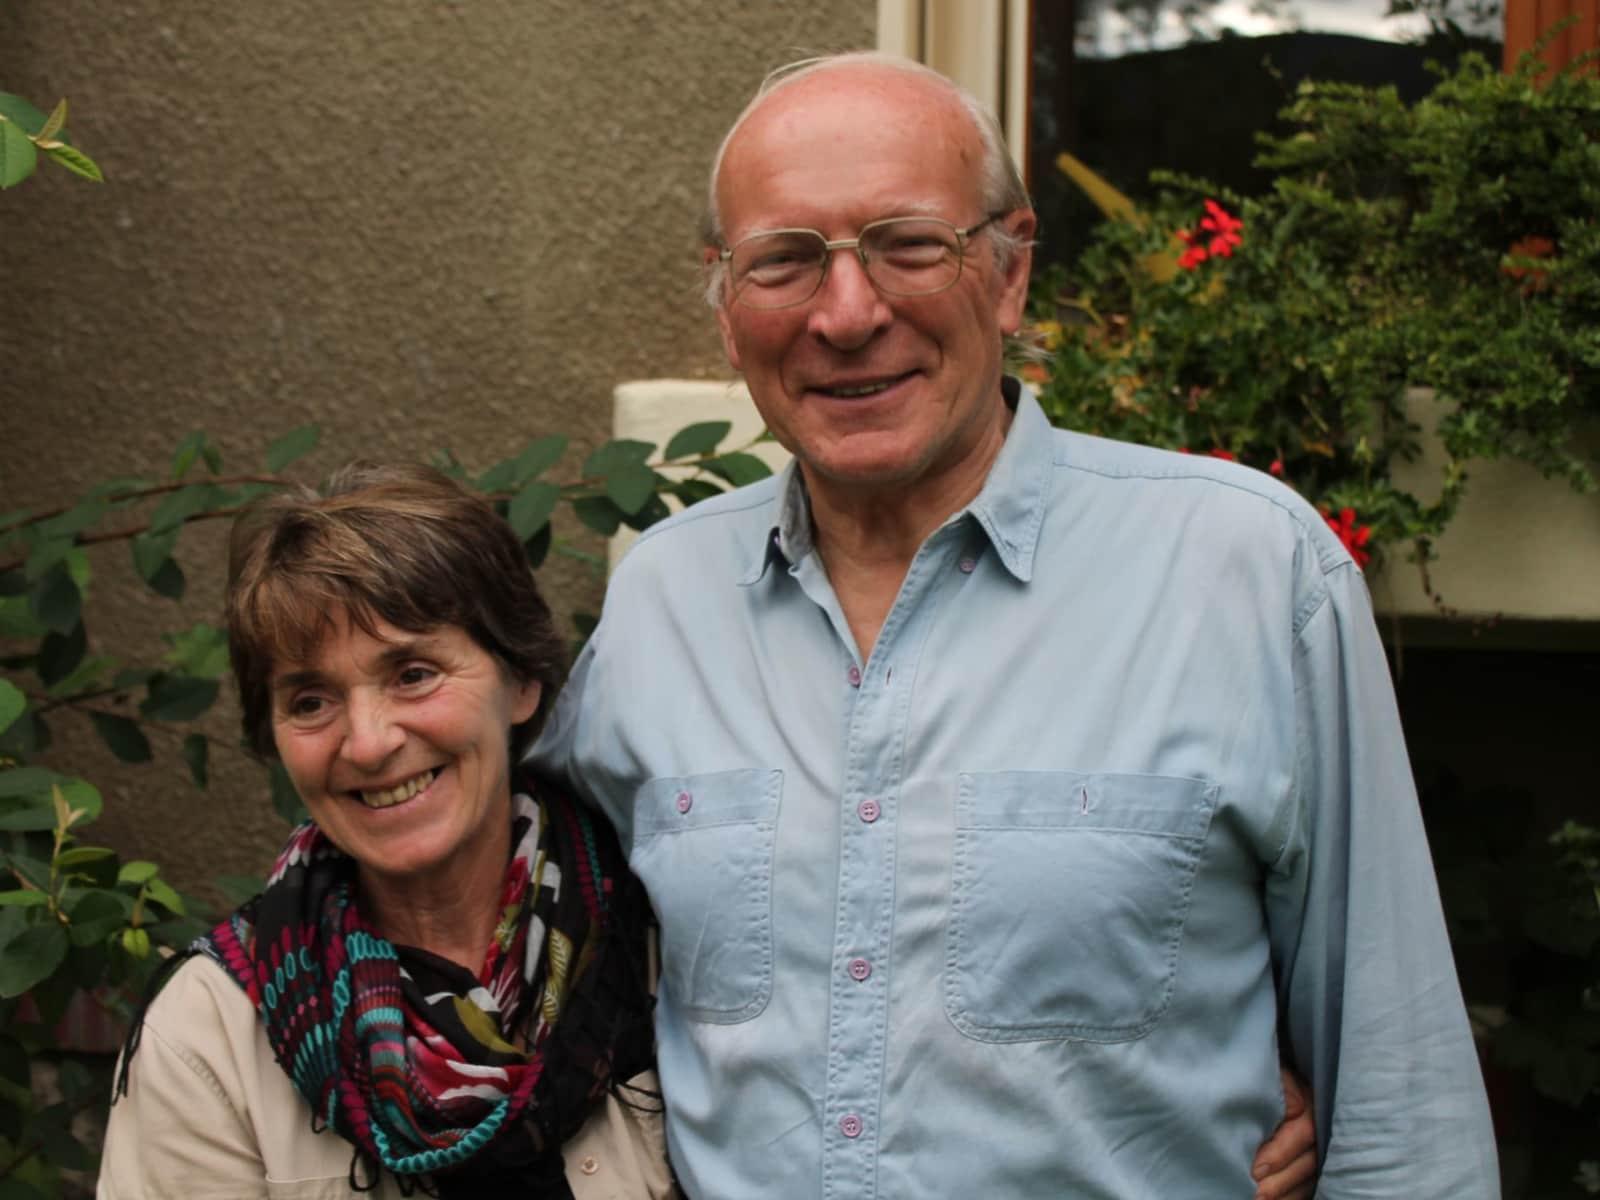 Helga & John from Foix, France